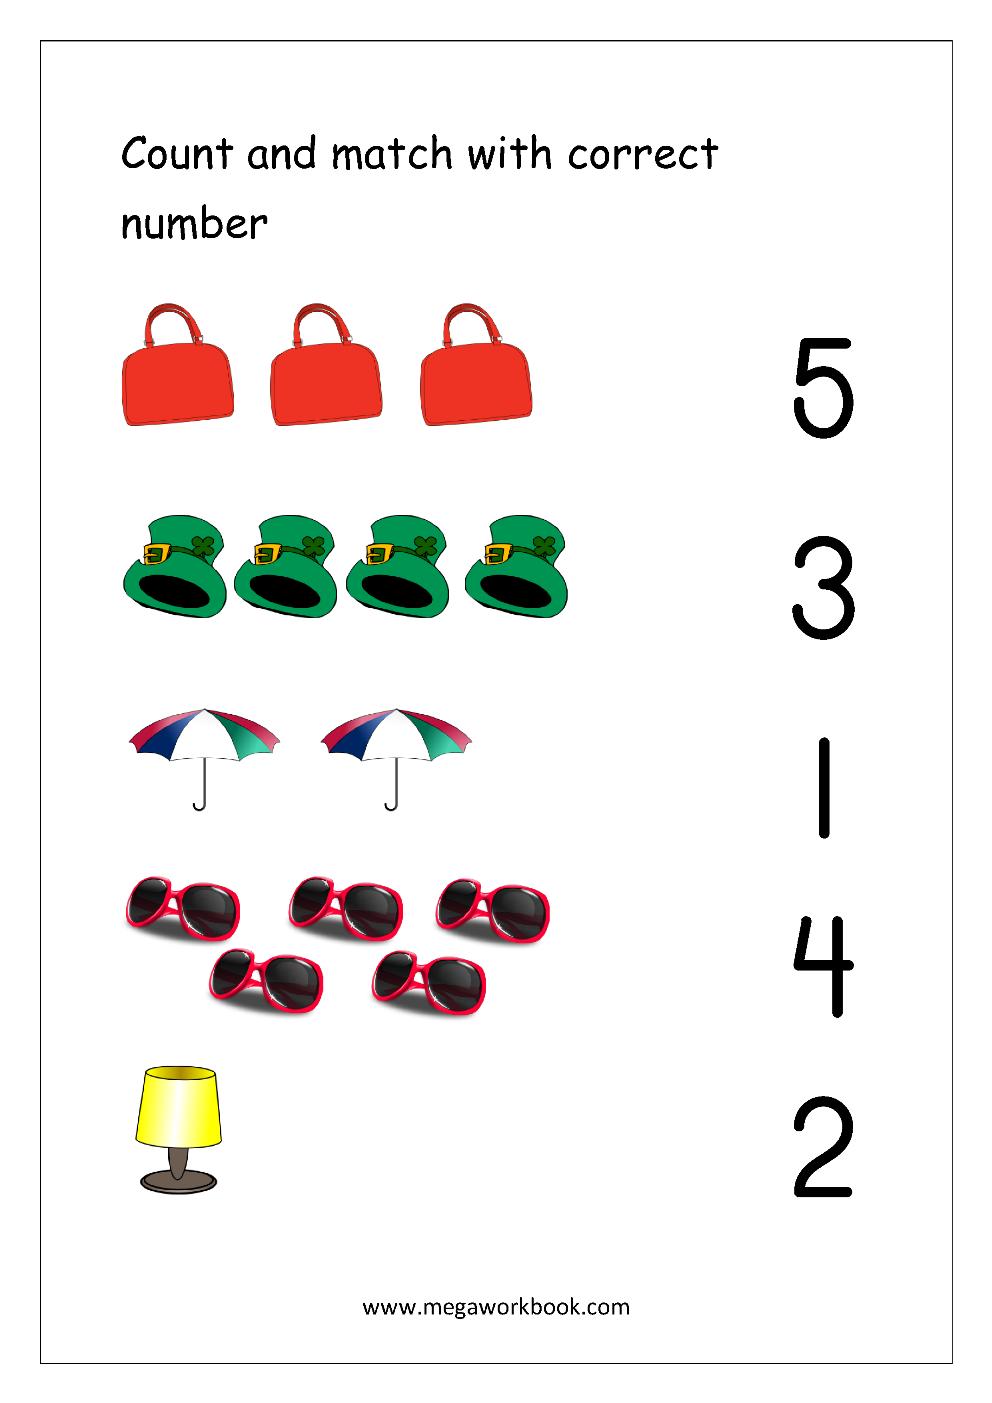 Free Math Worksheets Number Matching Megaworkbook Basic Math Worksheets Free Math Worksheets Learning Worksheets [ 1403 x 992 Pixel ]